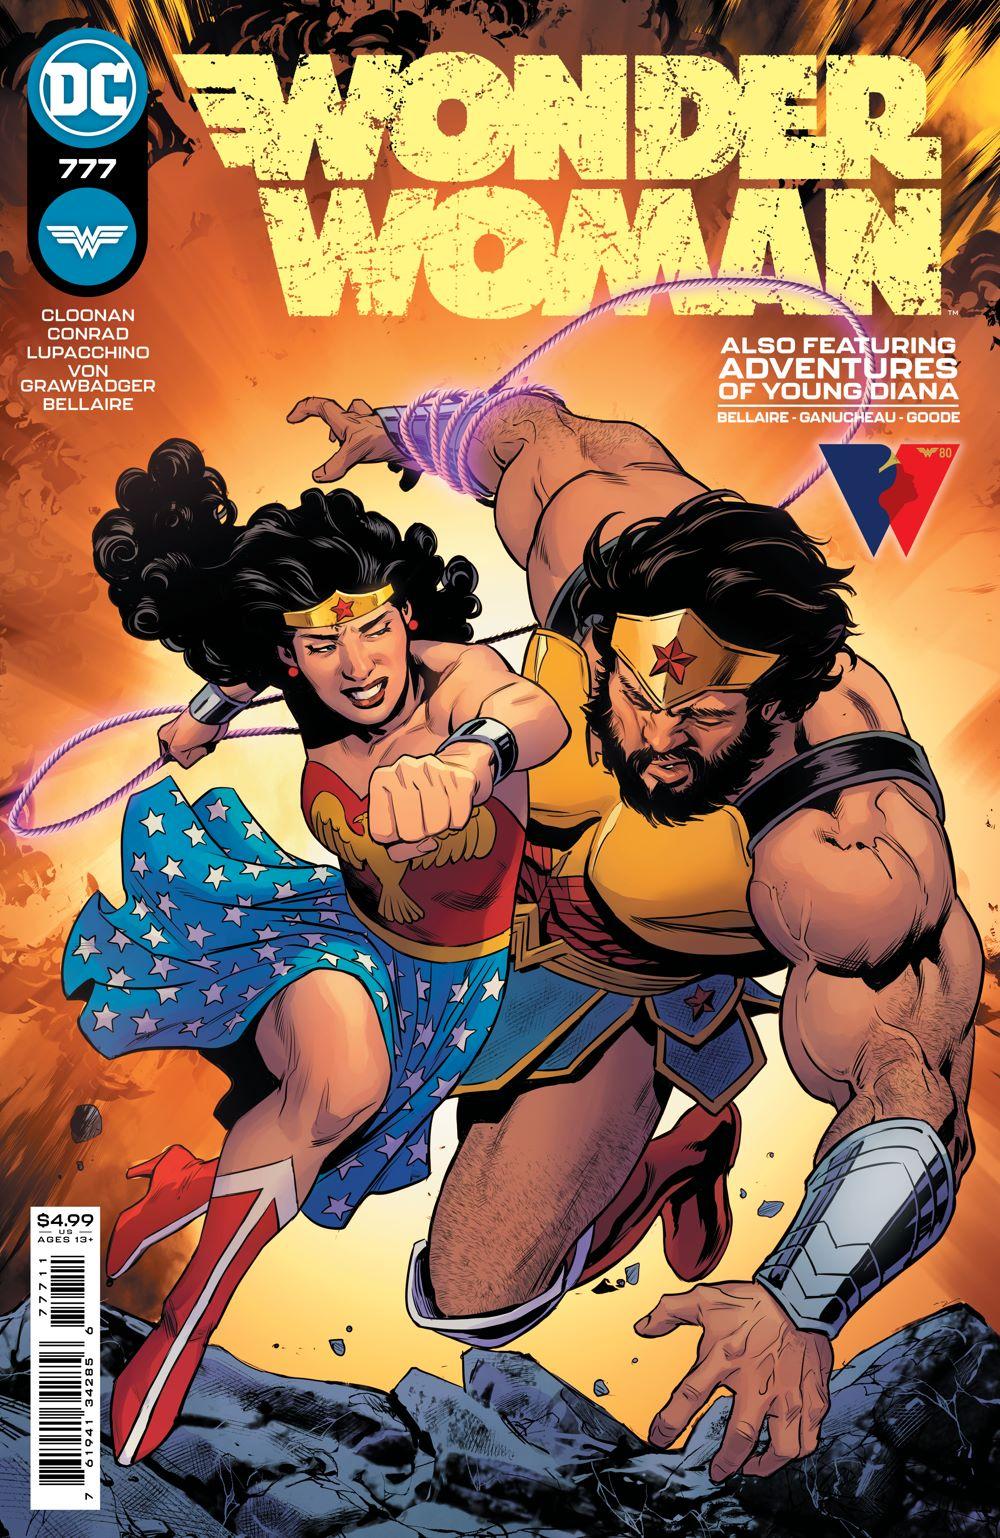 WONDERWOMAN_Cv777 DC Comics August 2021 Solicitations